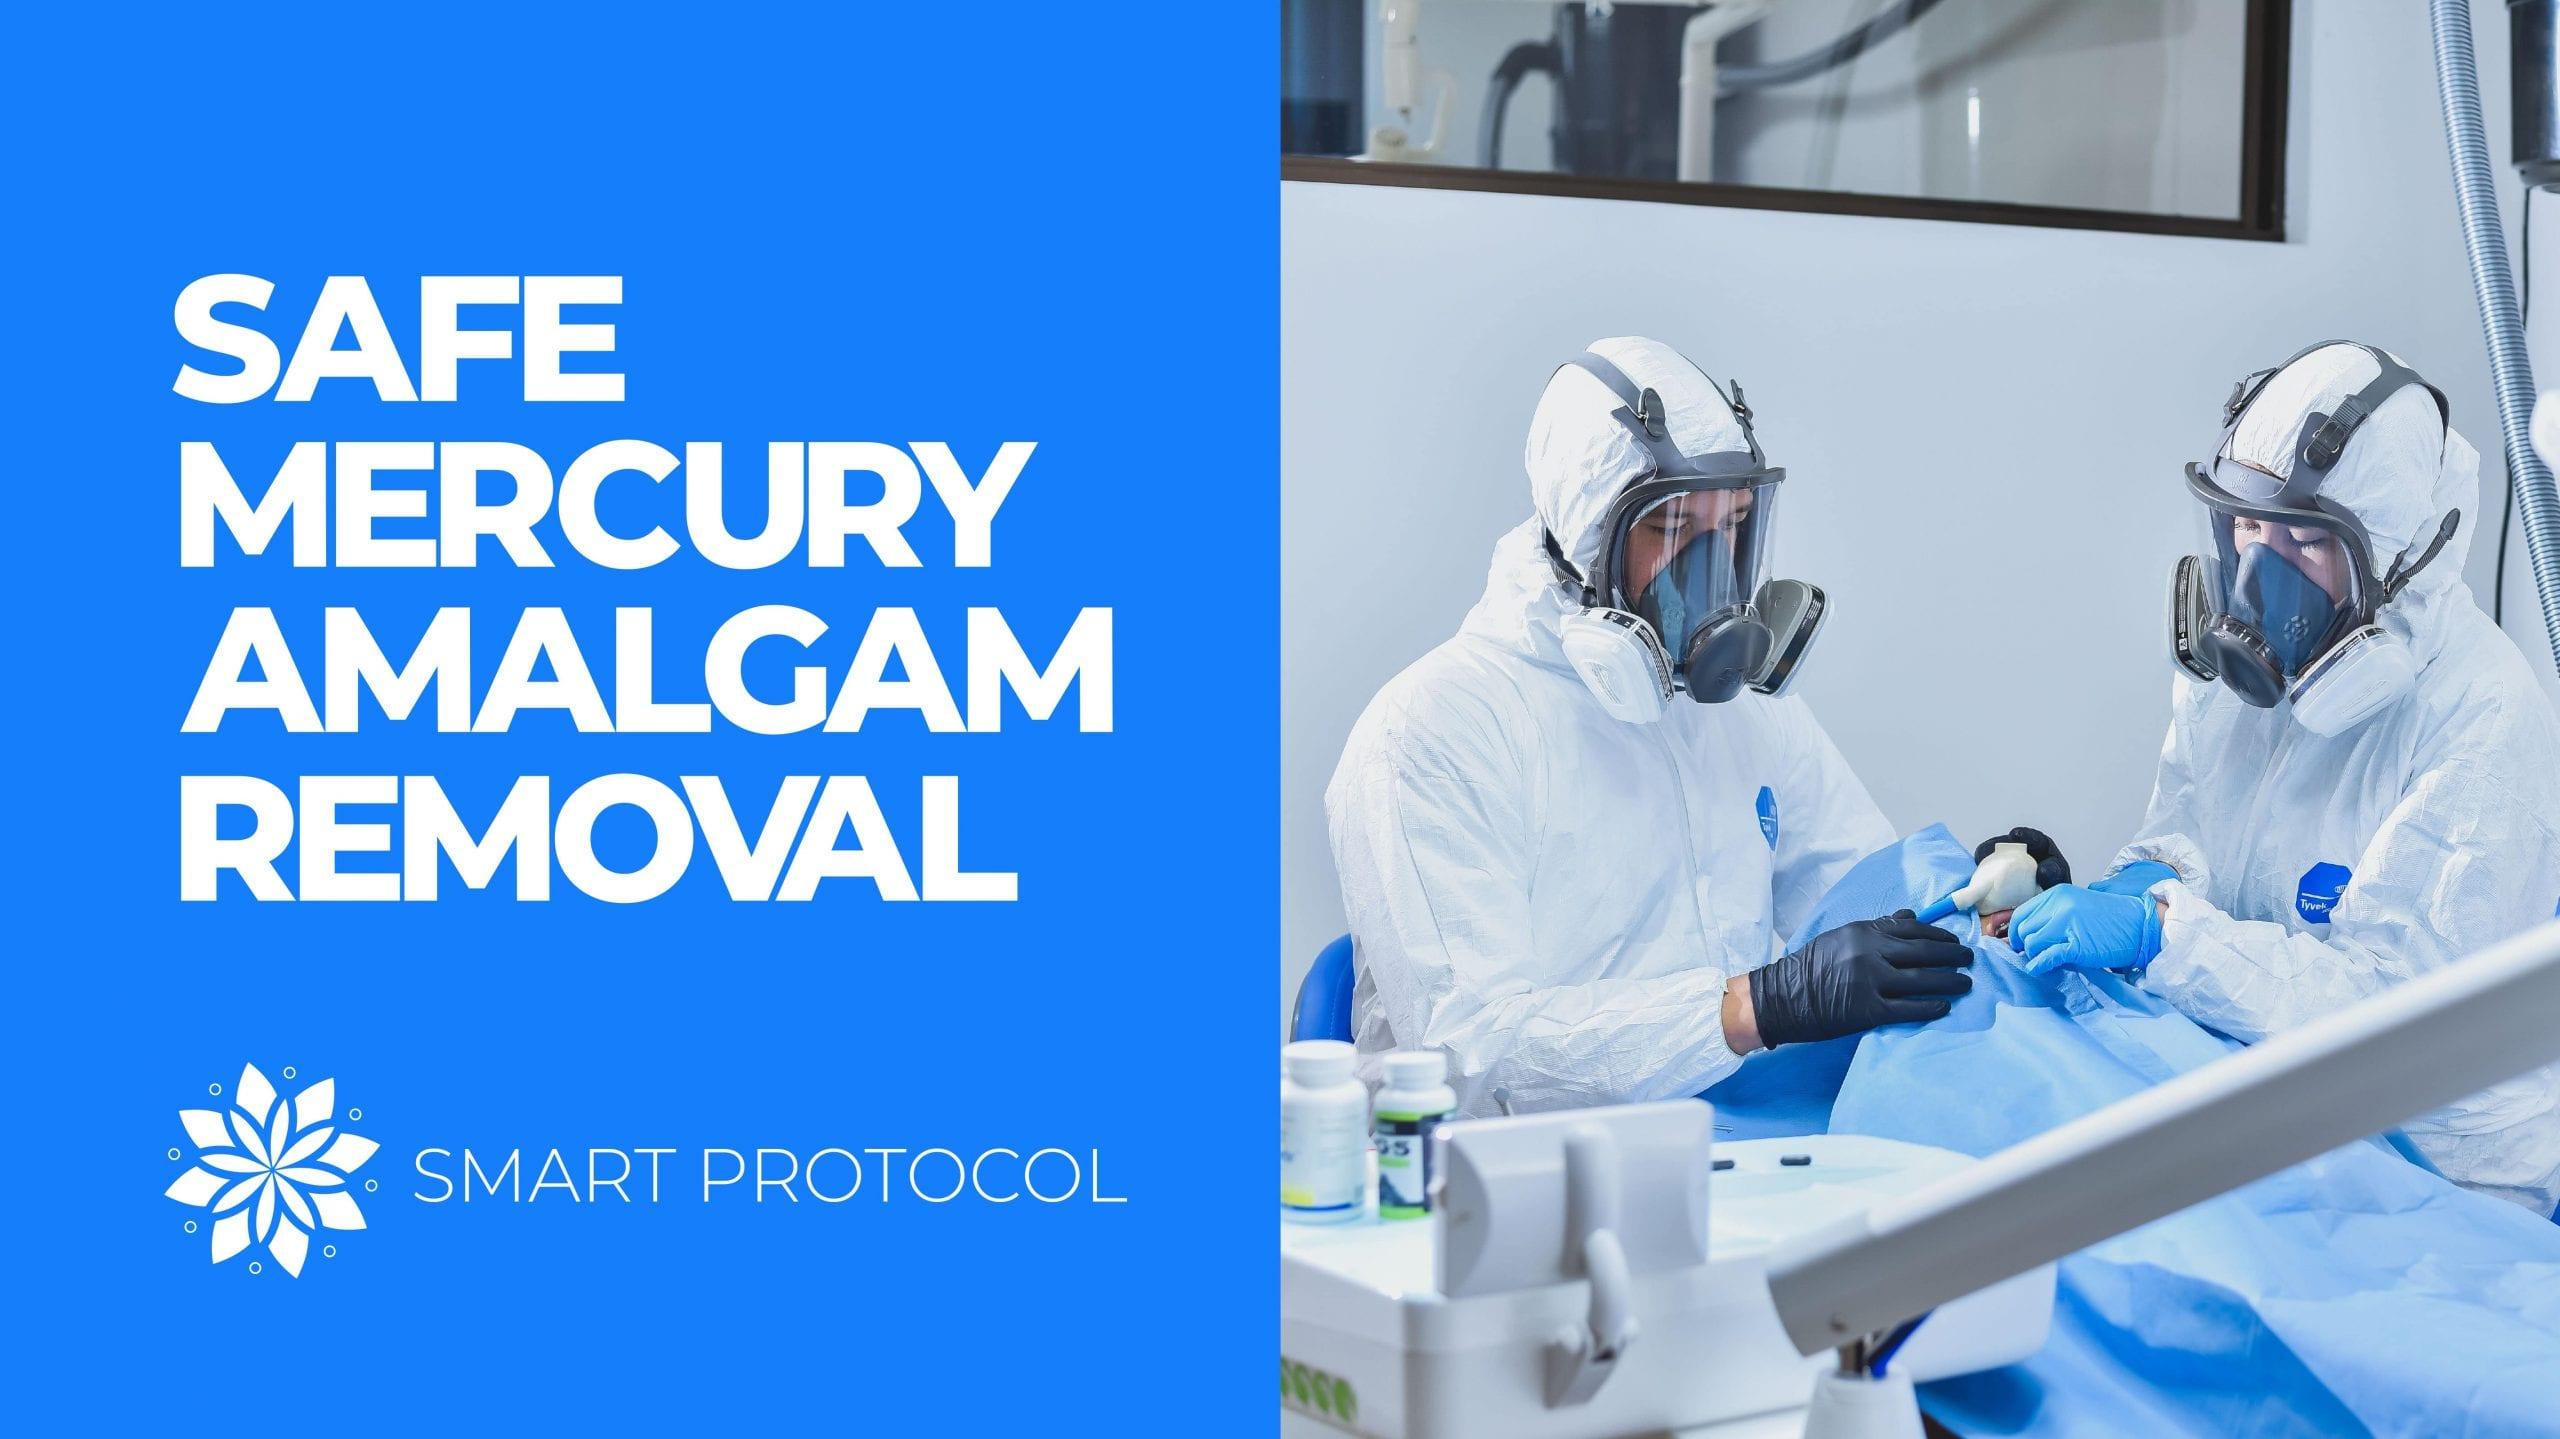 Save Mercury Amalgam Removal